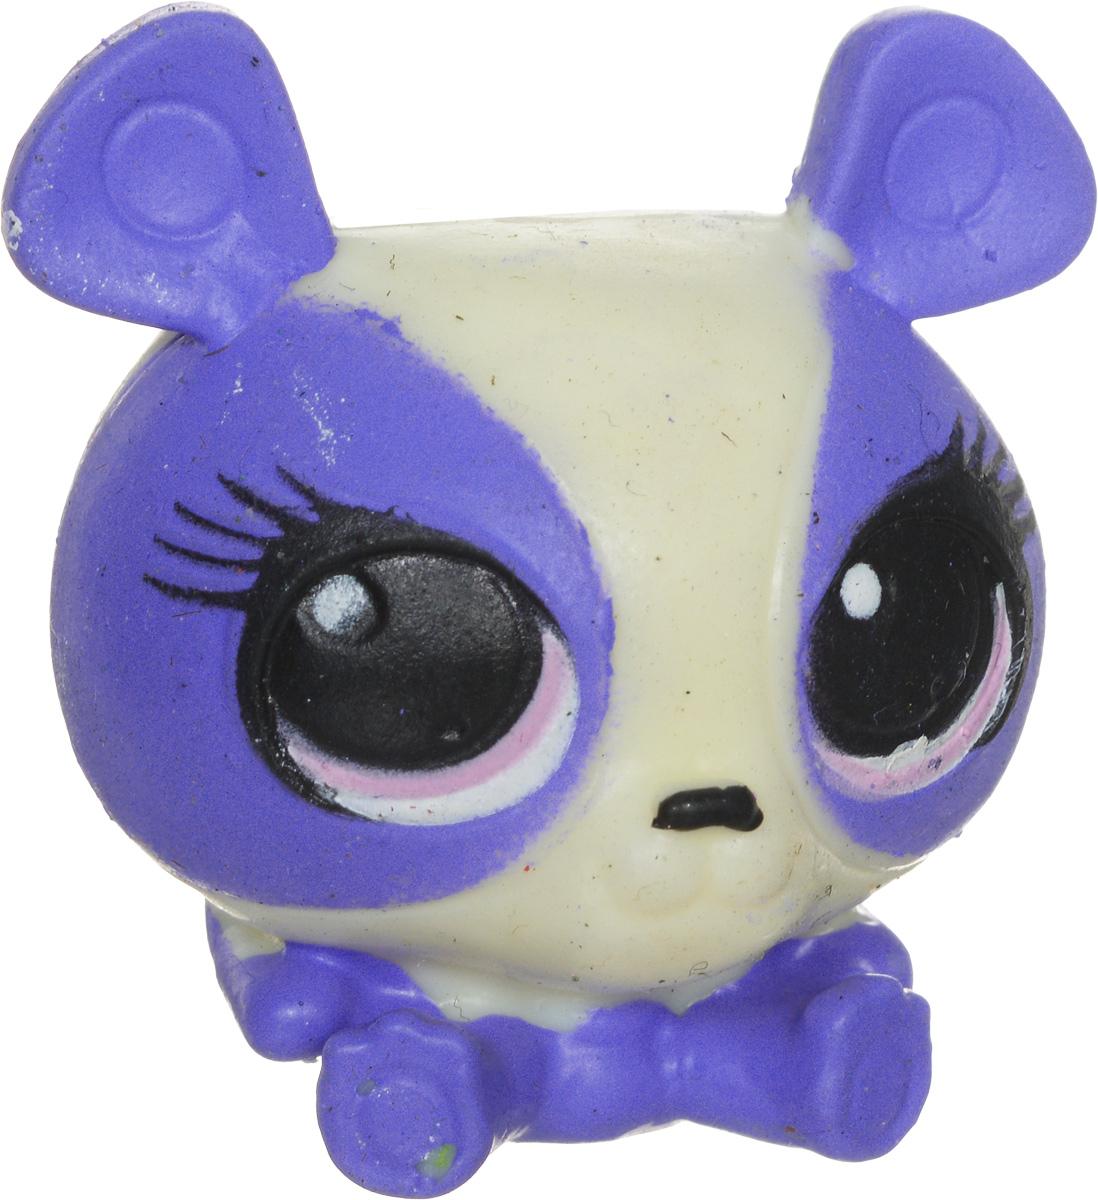 Littlest Pet Shop Фигурка-мялка цвет фиолетовый белый littlest pet shop мягкая игрушка bullena